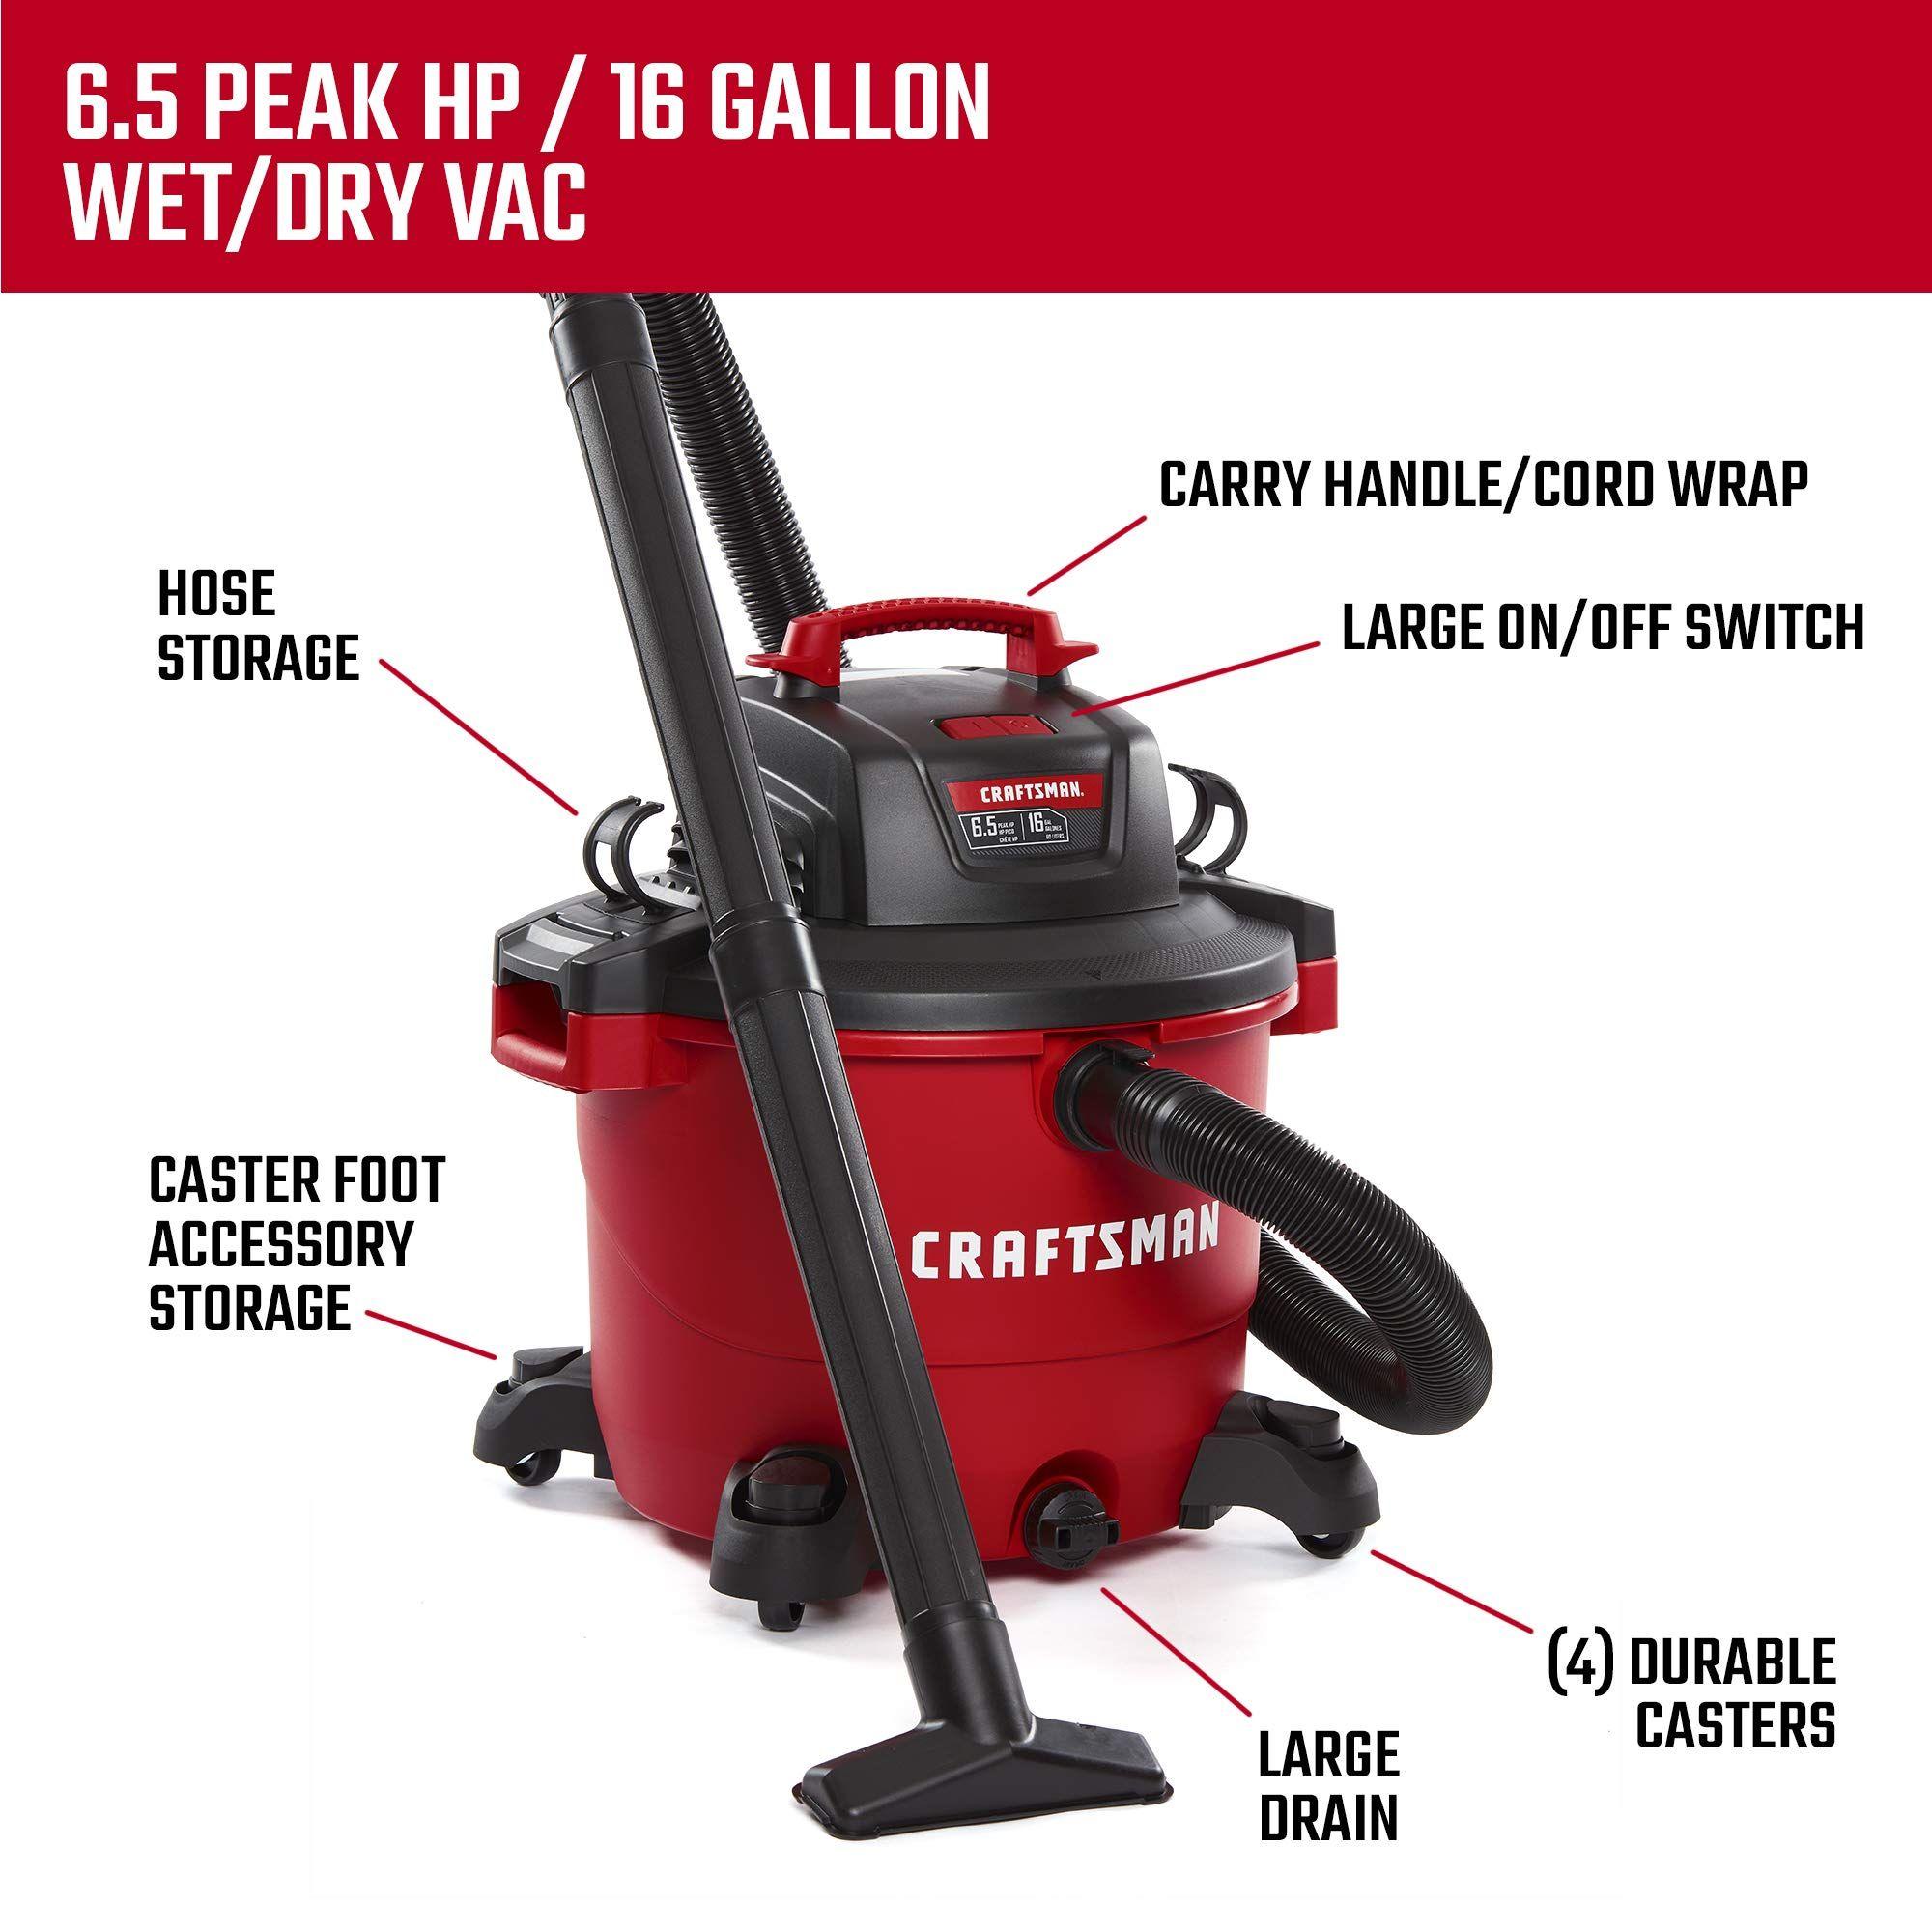 Craftsman Cmxevbe17595 16 Gallon 6 5 Peak Hp Wet Dry Vac Heavy